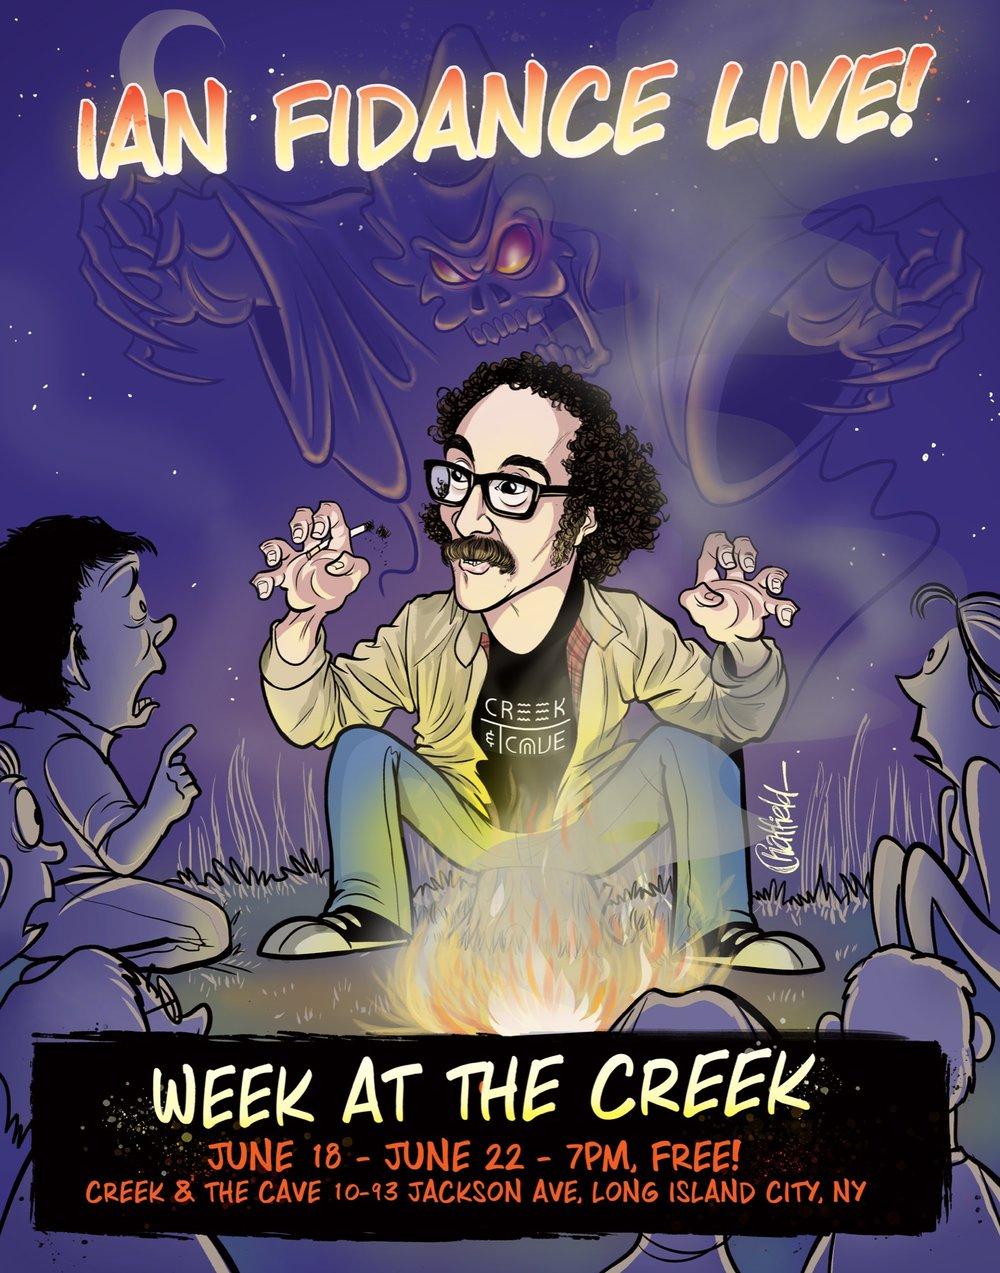 20180608_Ian Fidance Live.jpg